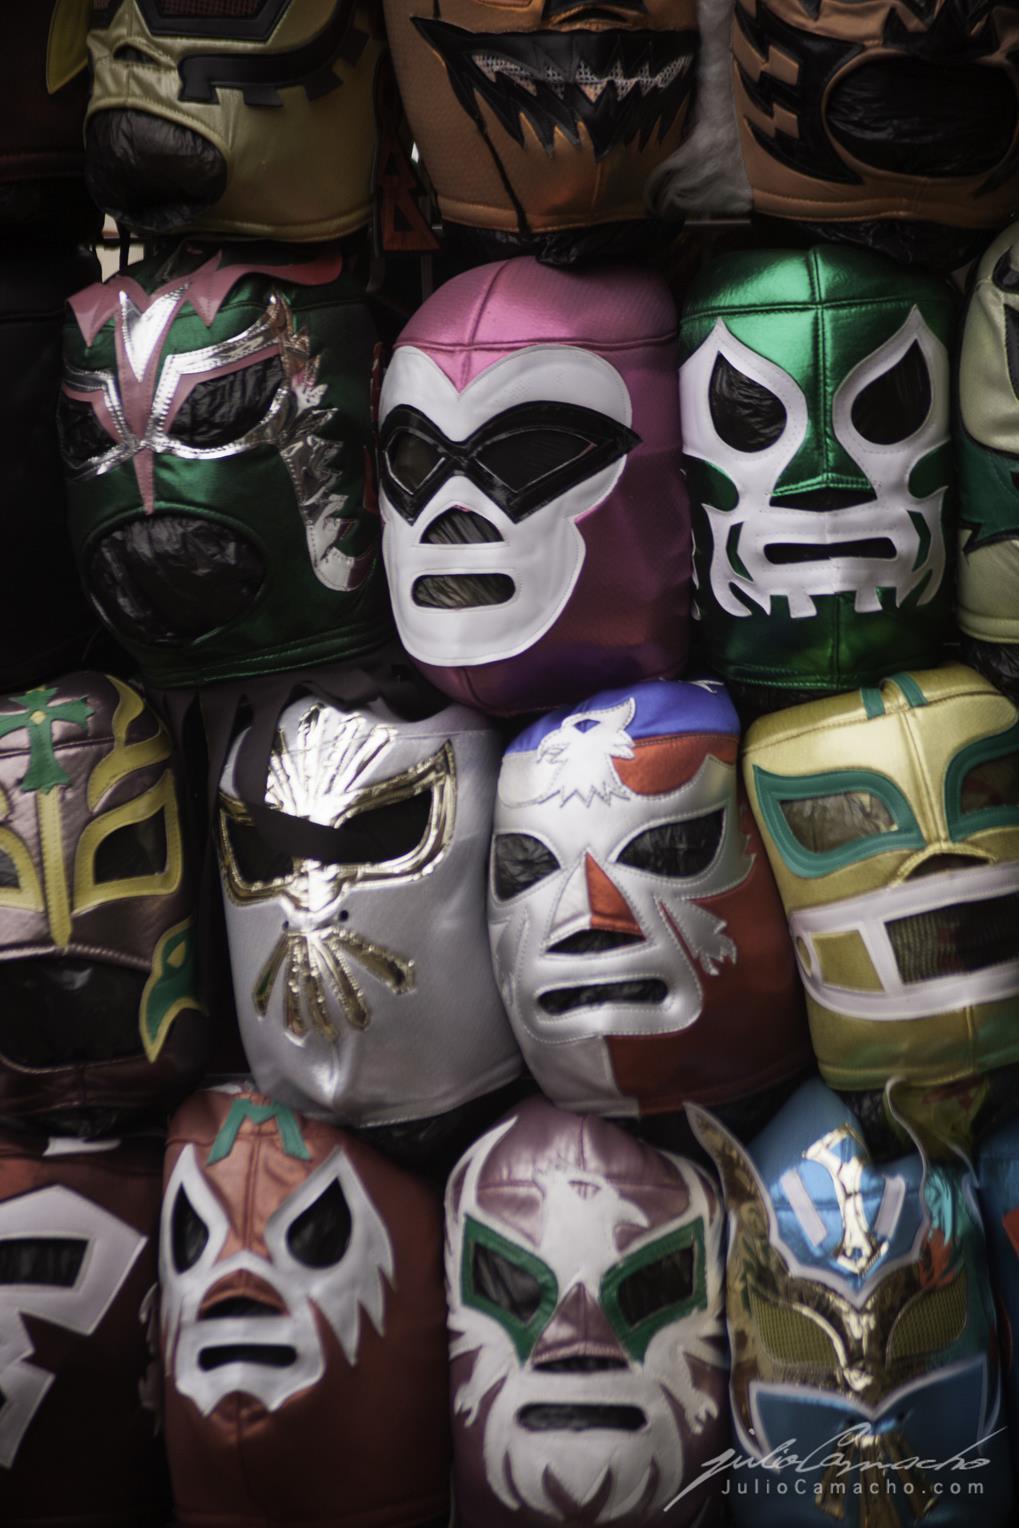 2014-10-30 31 CAST TOUR Ensenada y Tijuana - 1294 - www.Juli (Copy).jpg